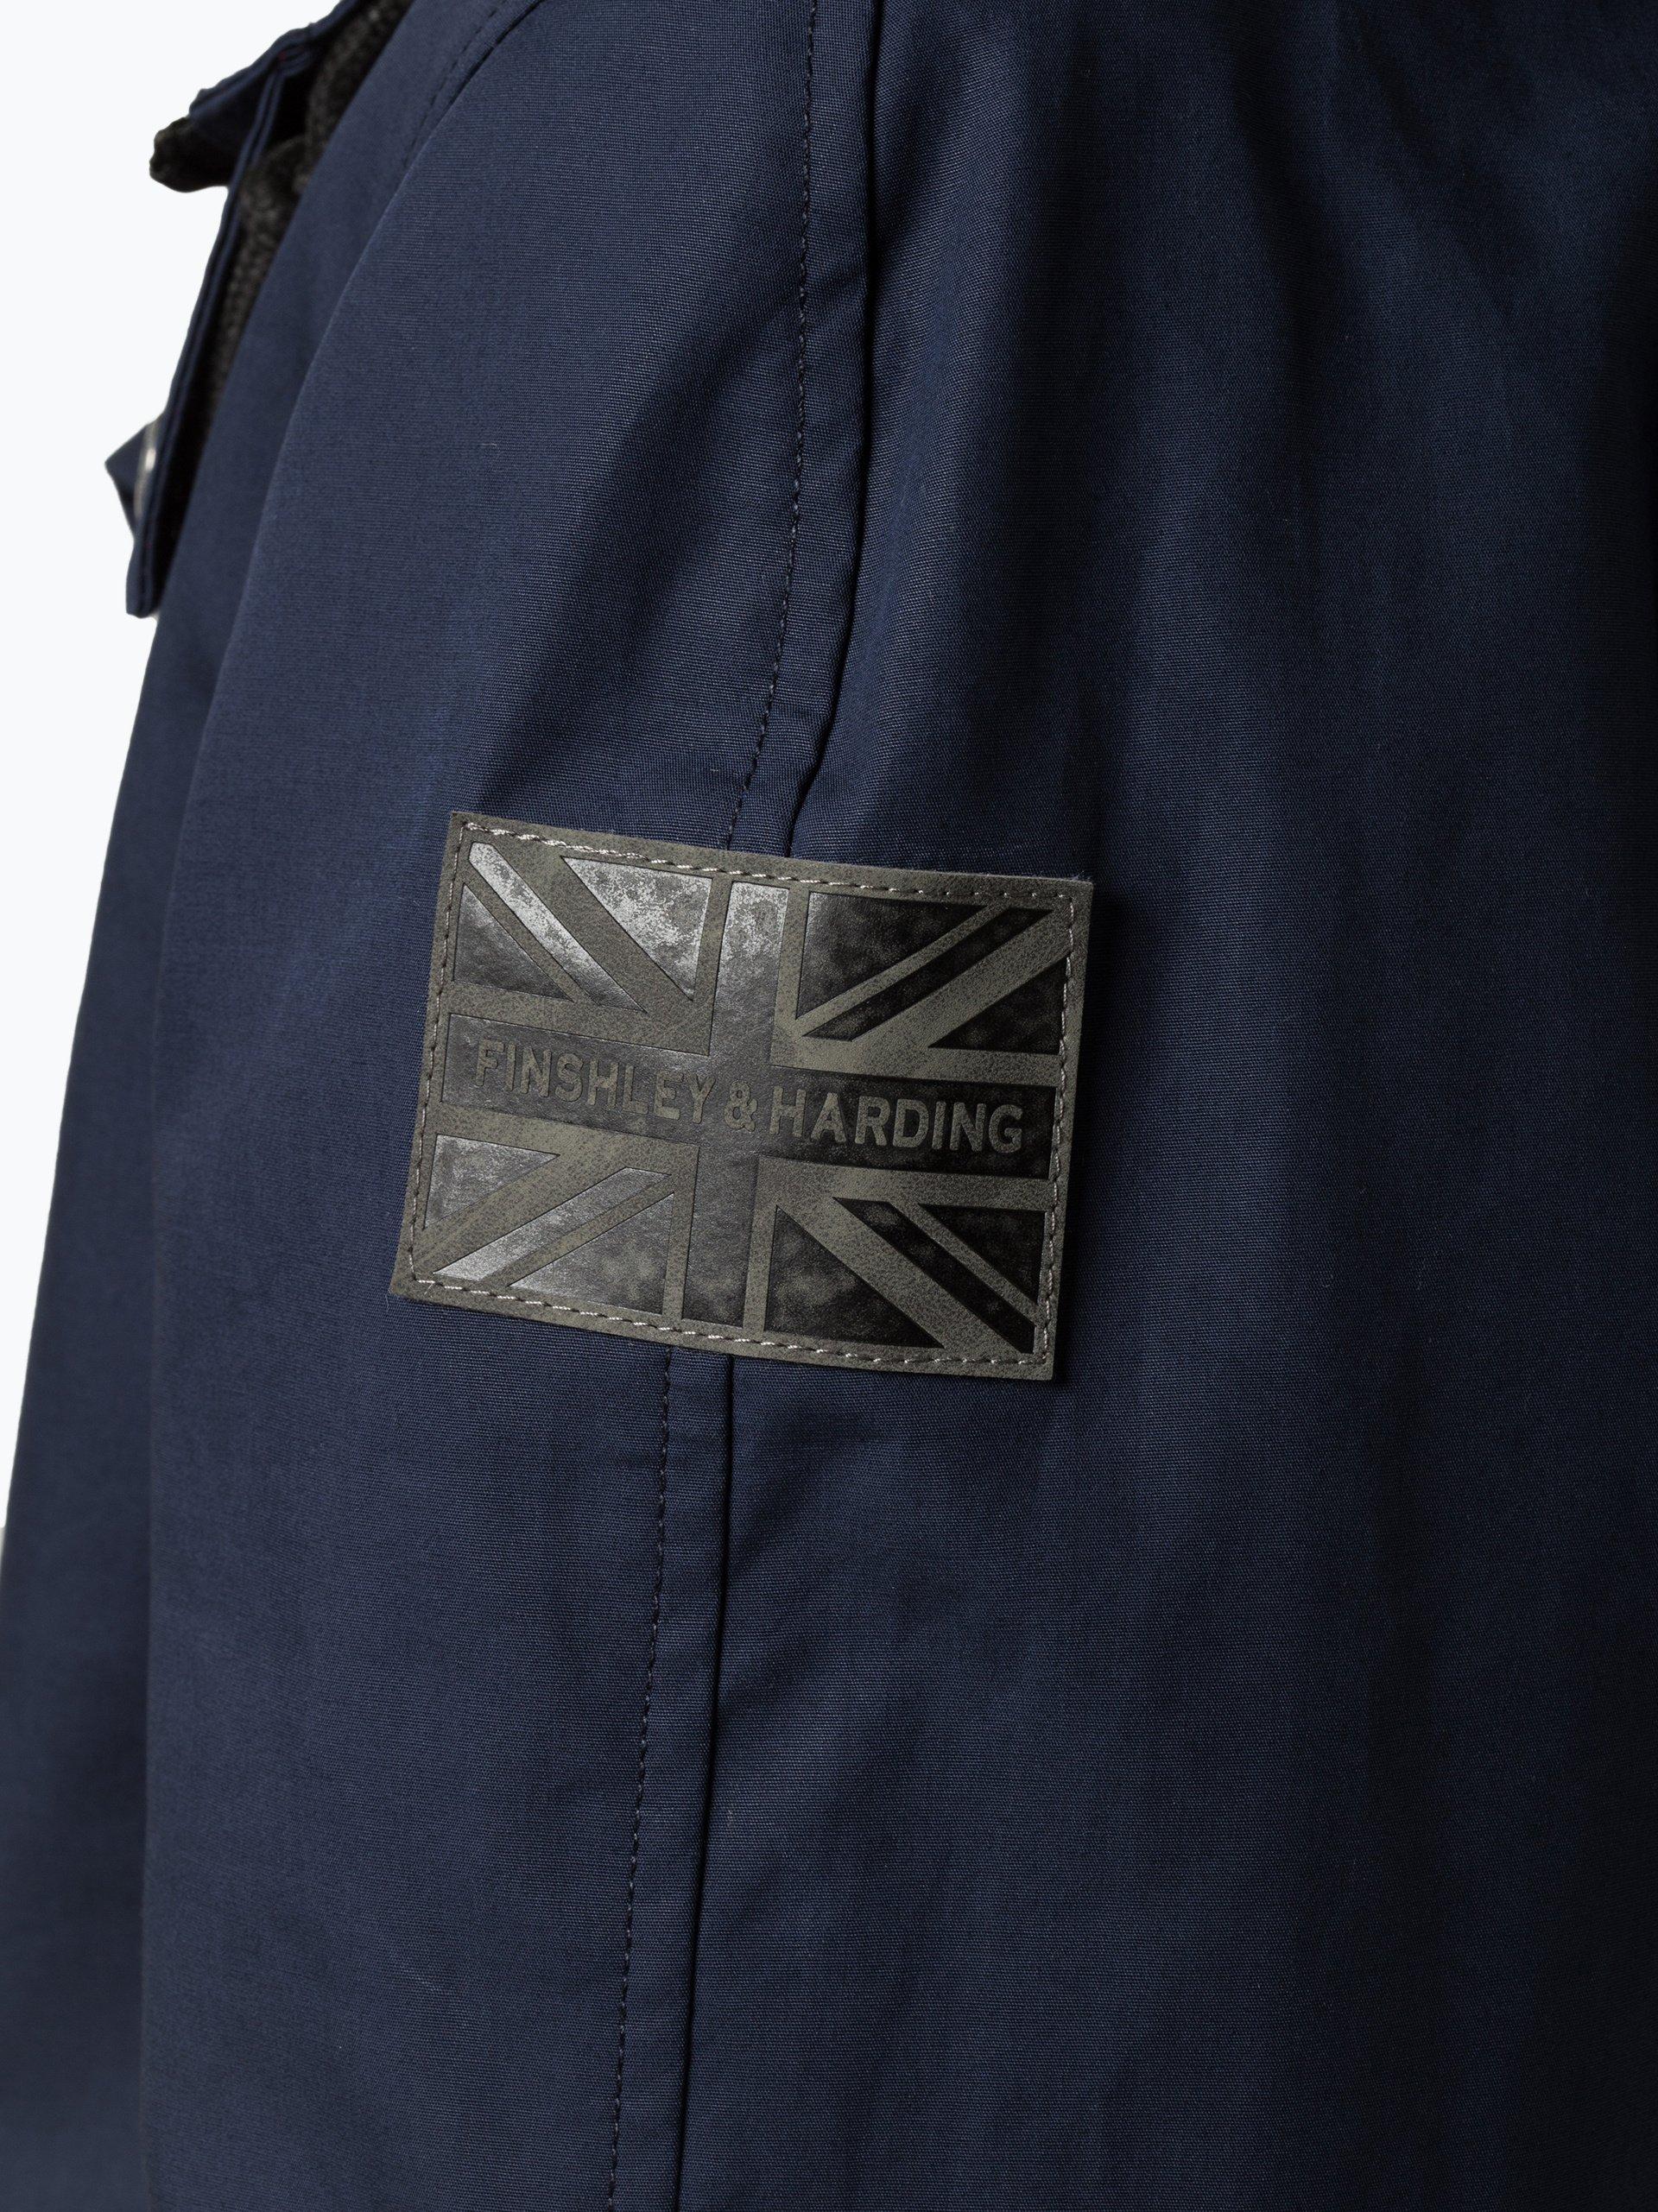 Finshley & Harding London Herren Mantel - Saied